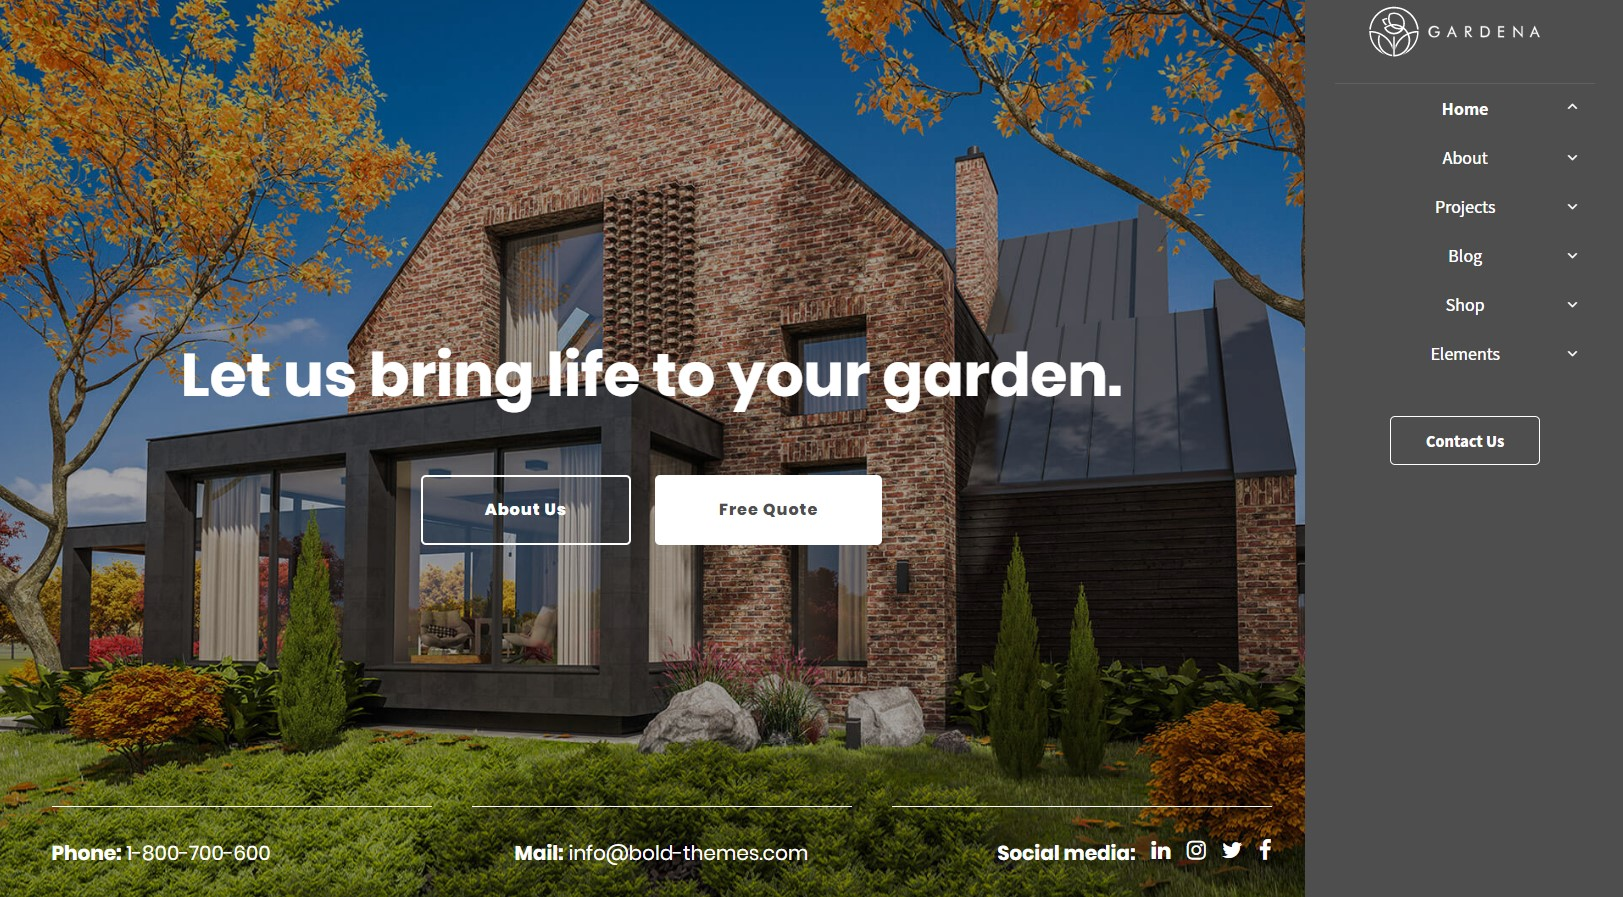 https://documentation.bold-themes.com/gardena/wp-content/uploads/sites/50/2019/10/menu-vertical-right.jpg